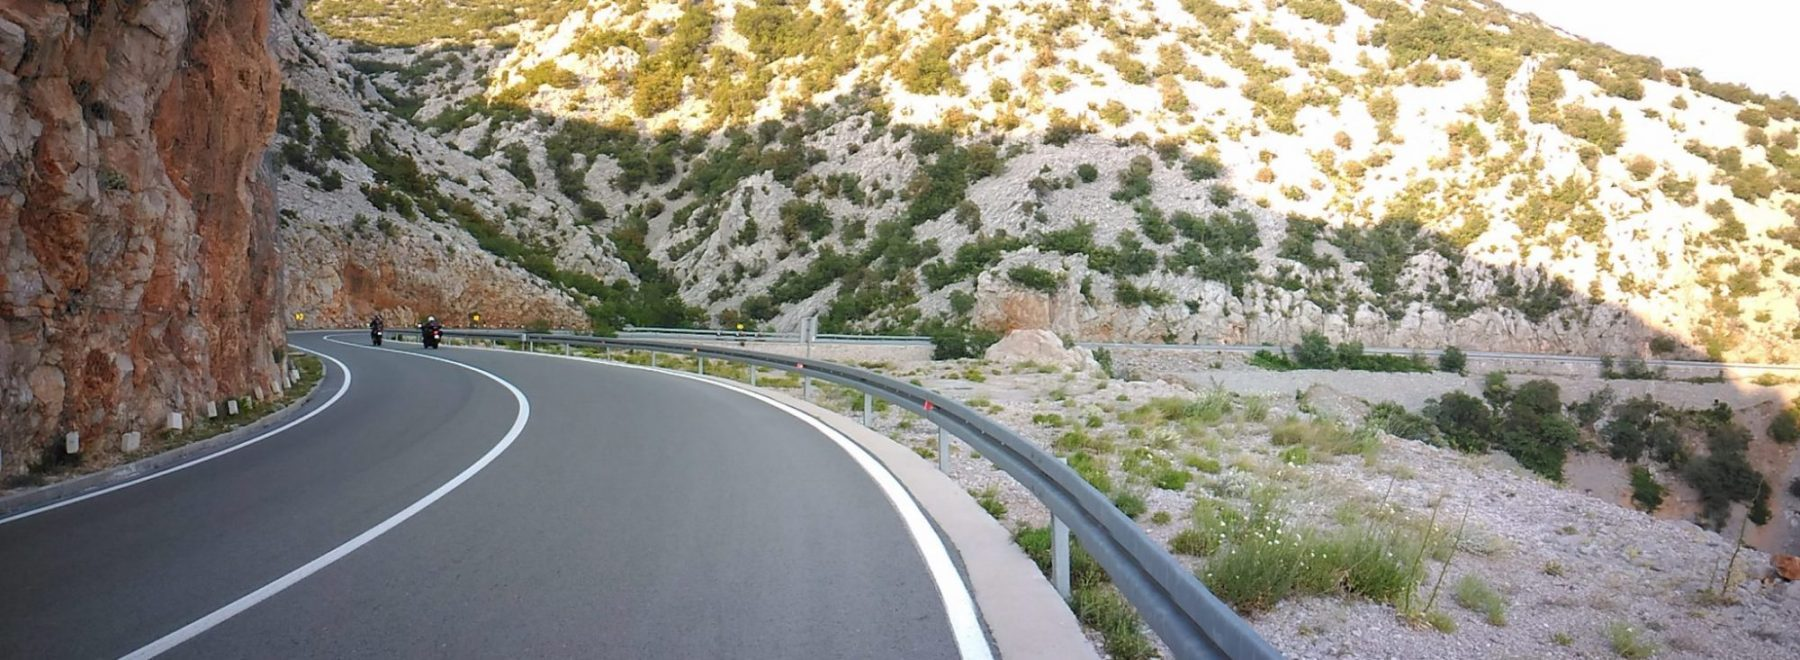 Ядранска магистрала